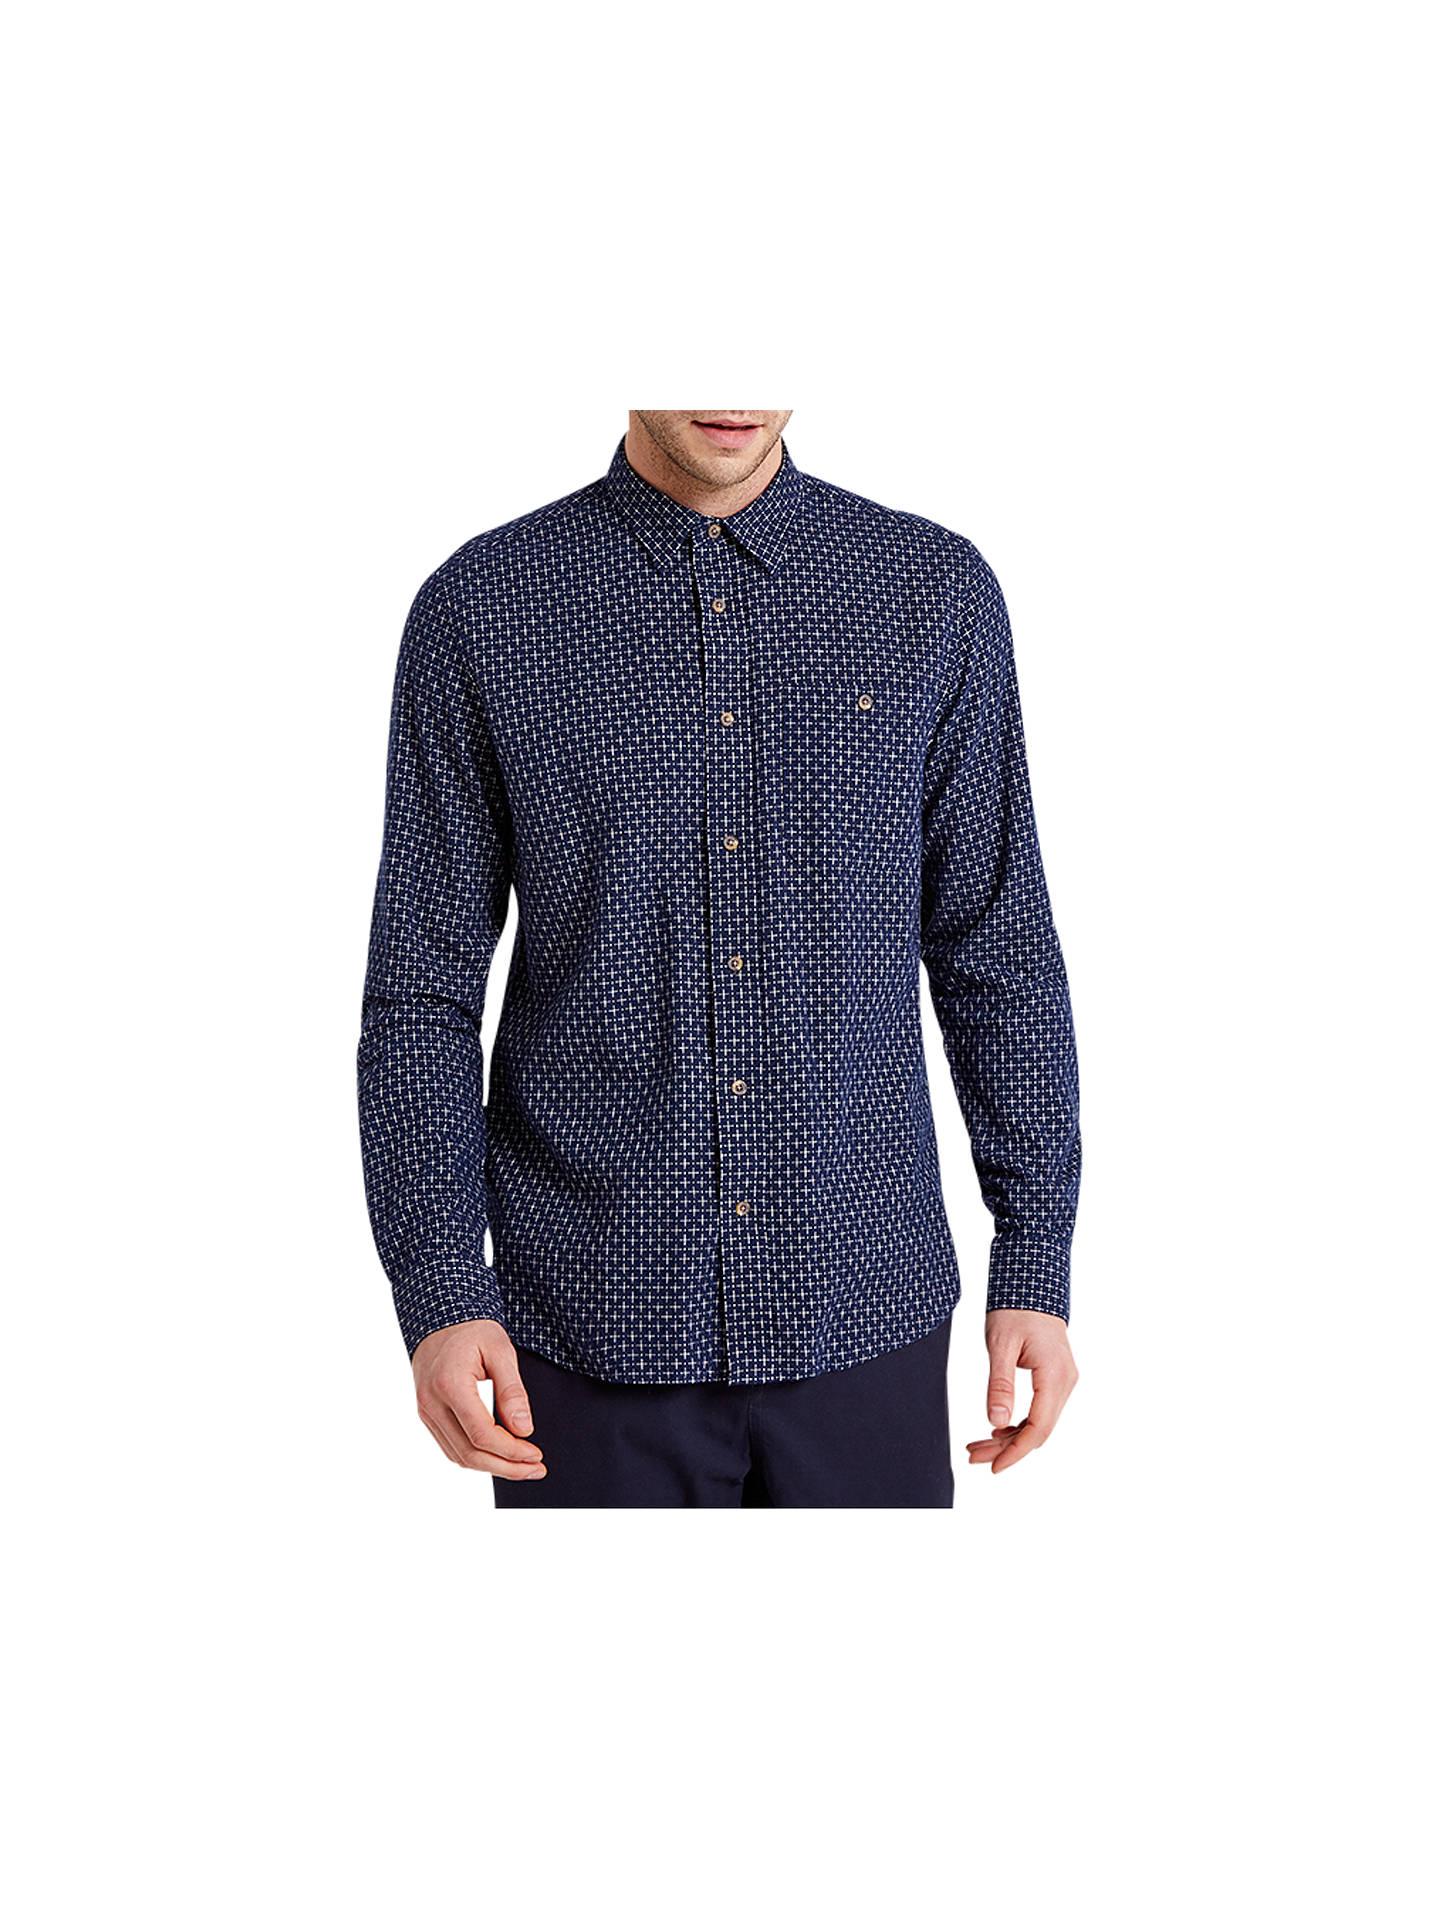 HYMN Target Cross Dobby Shirt, Indigo at John Lewis & Partners